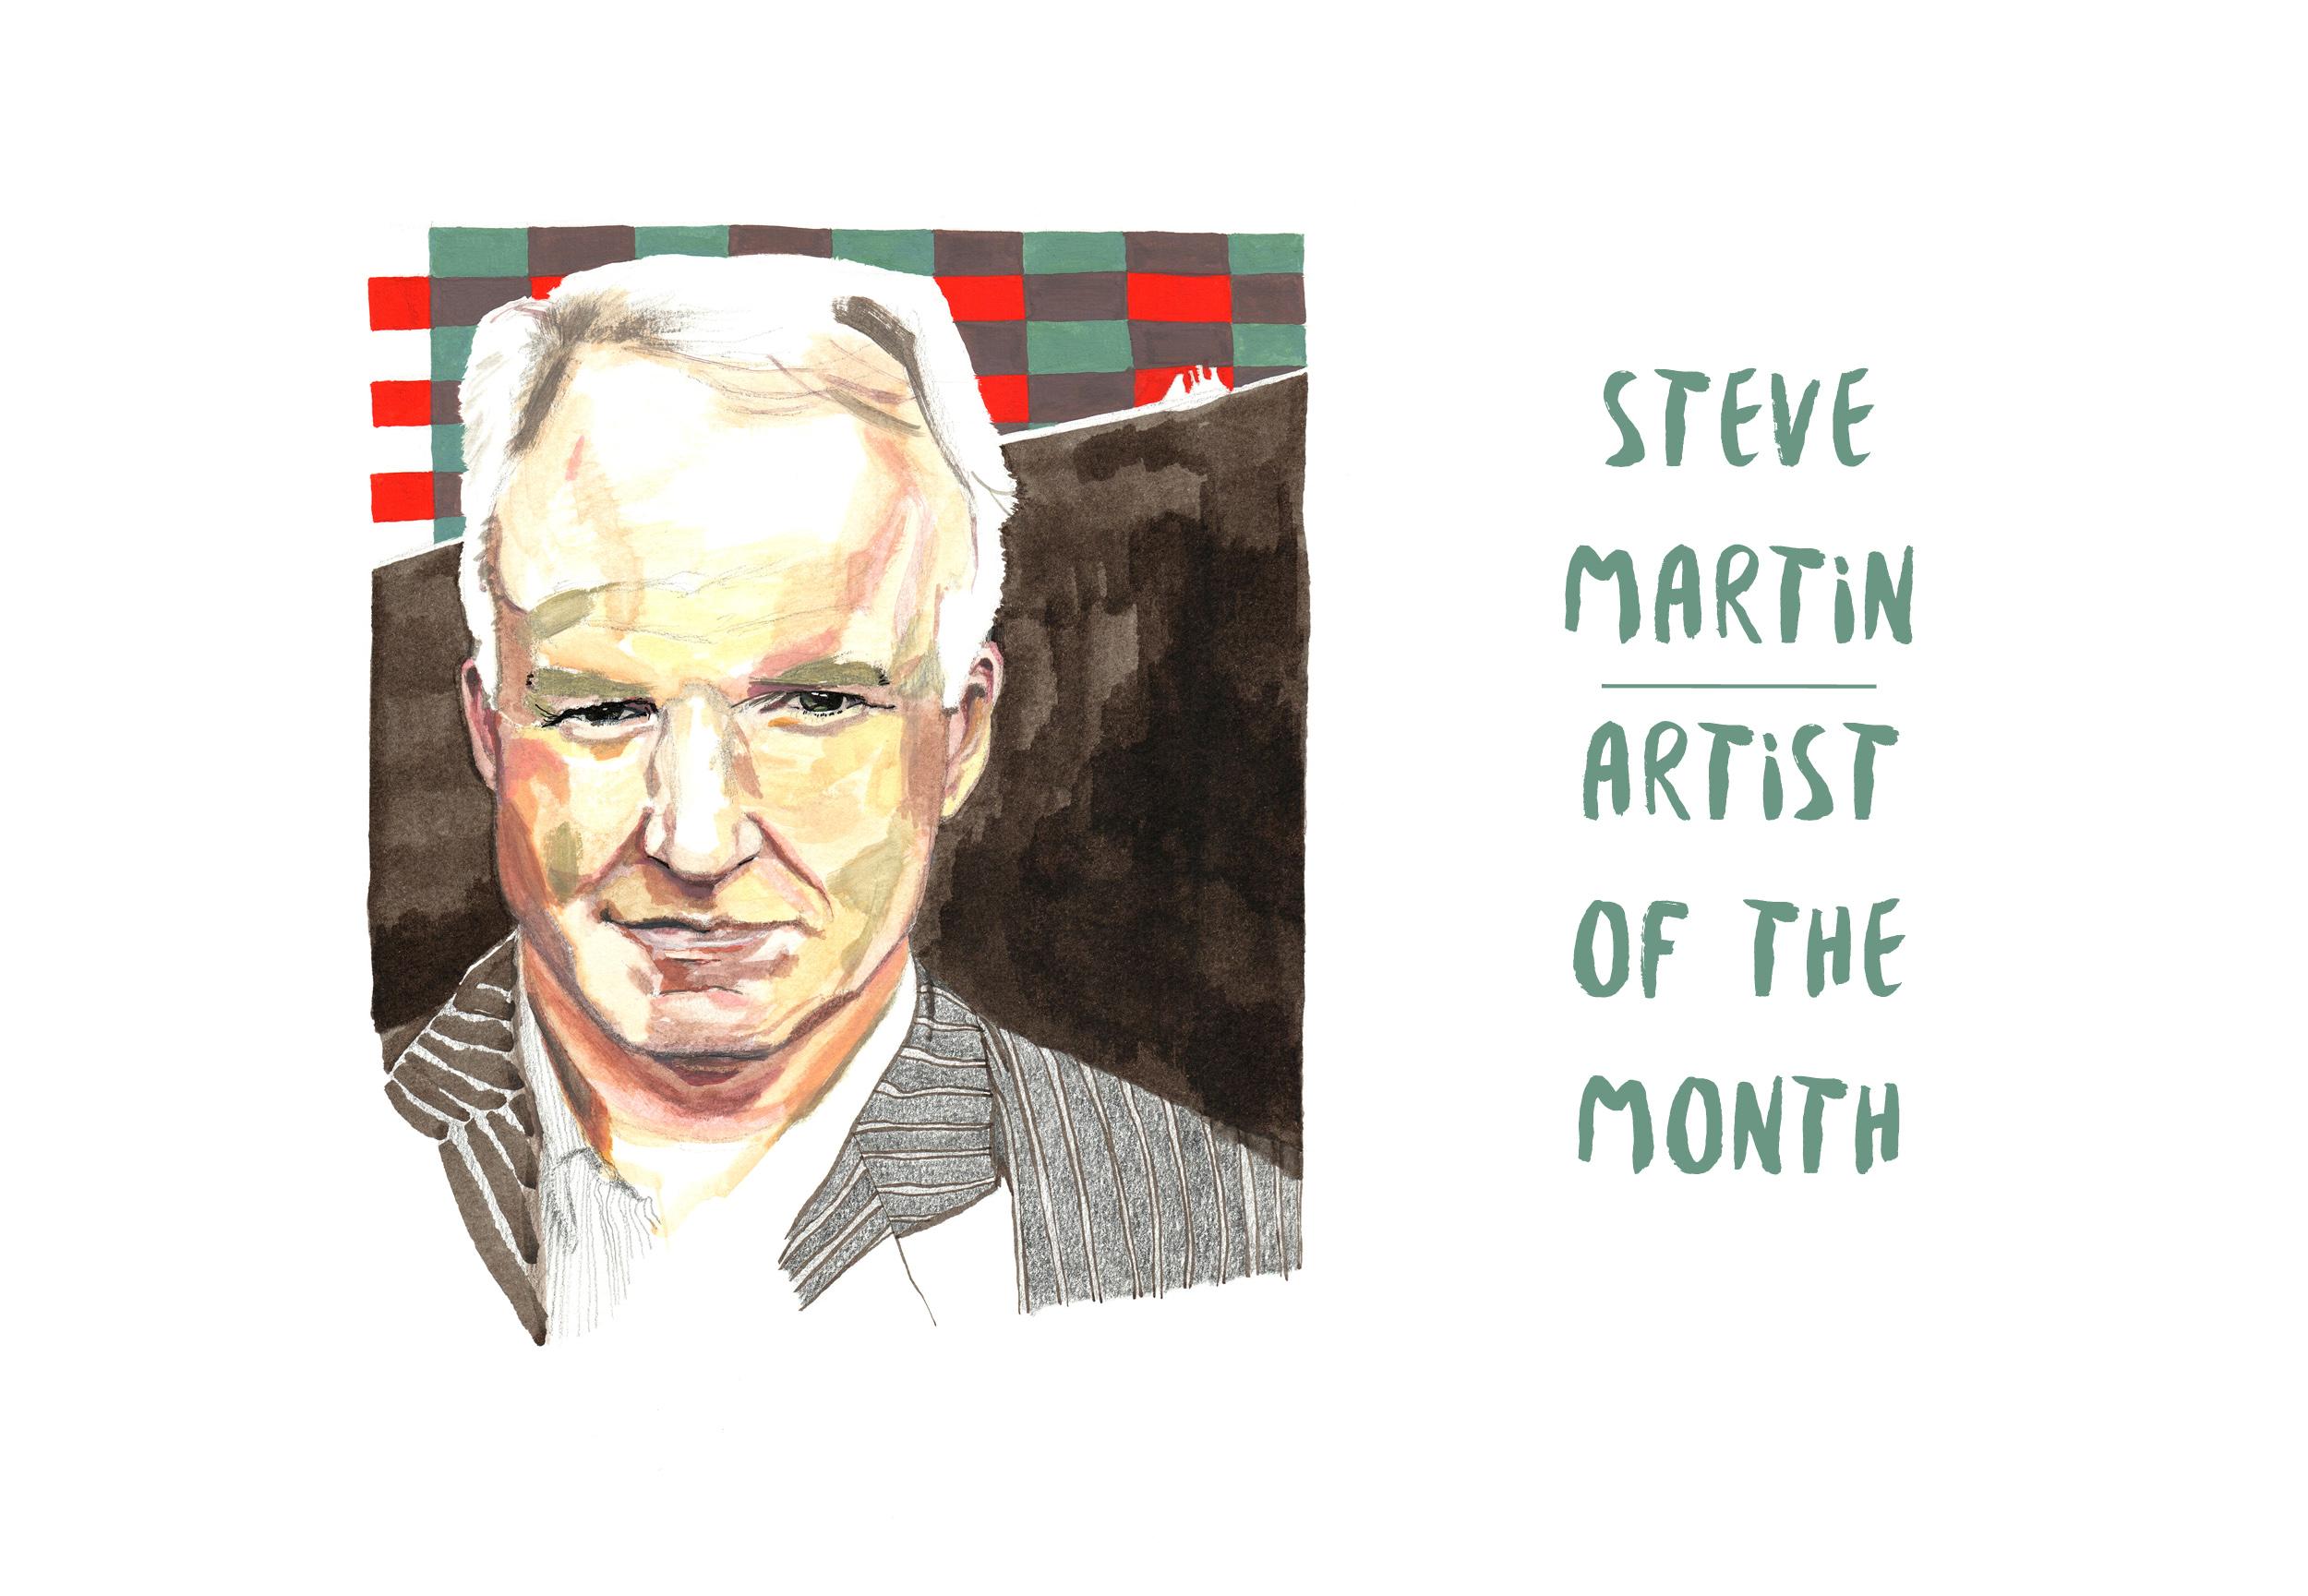 Steve Martin: Making the Same Sound Different